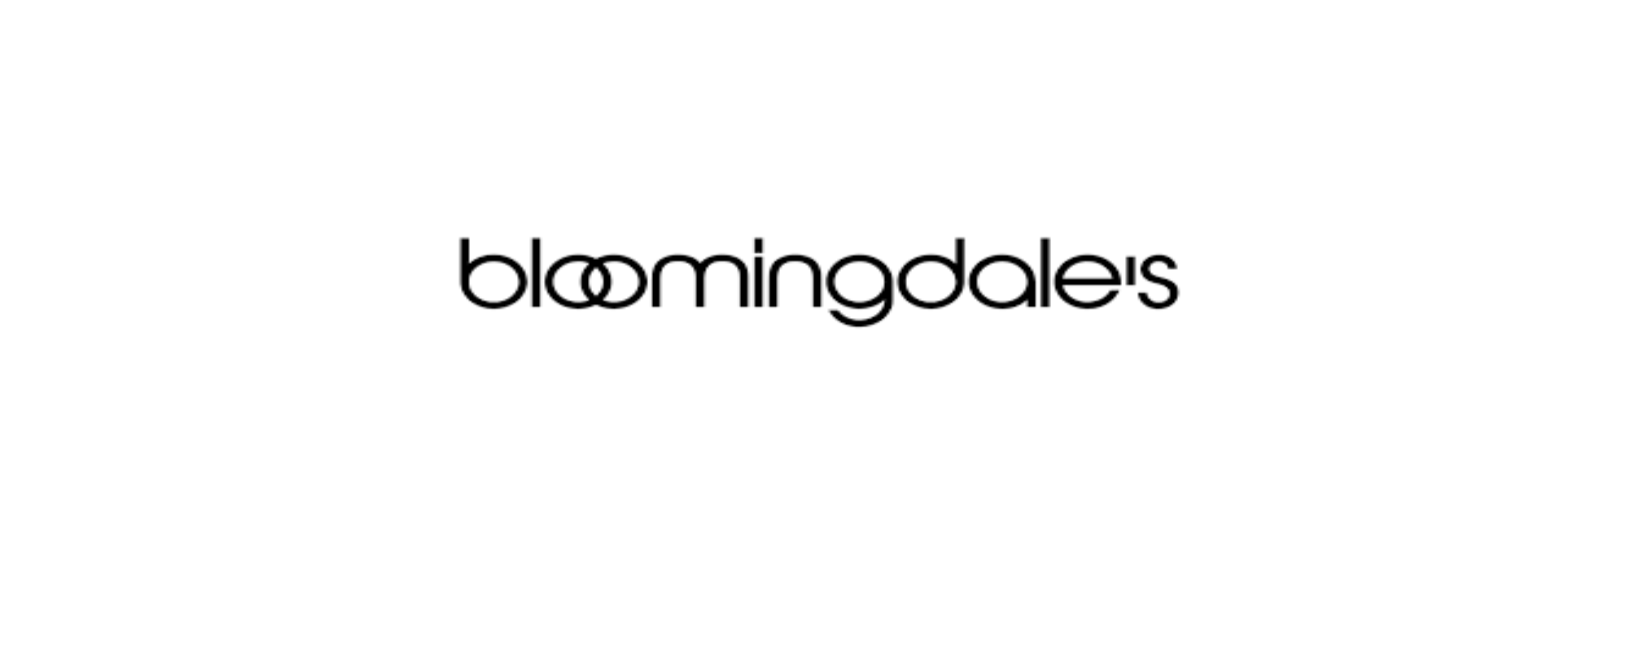 Bloomingdales Discount Code 2021